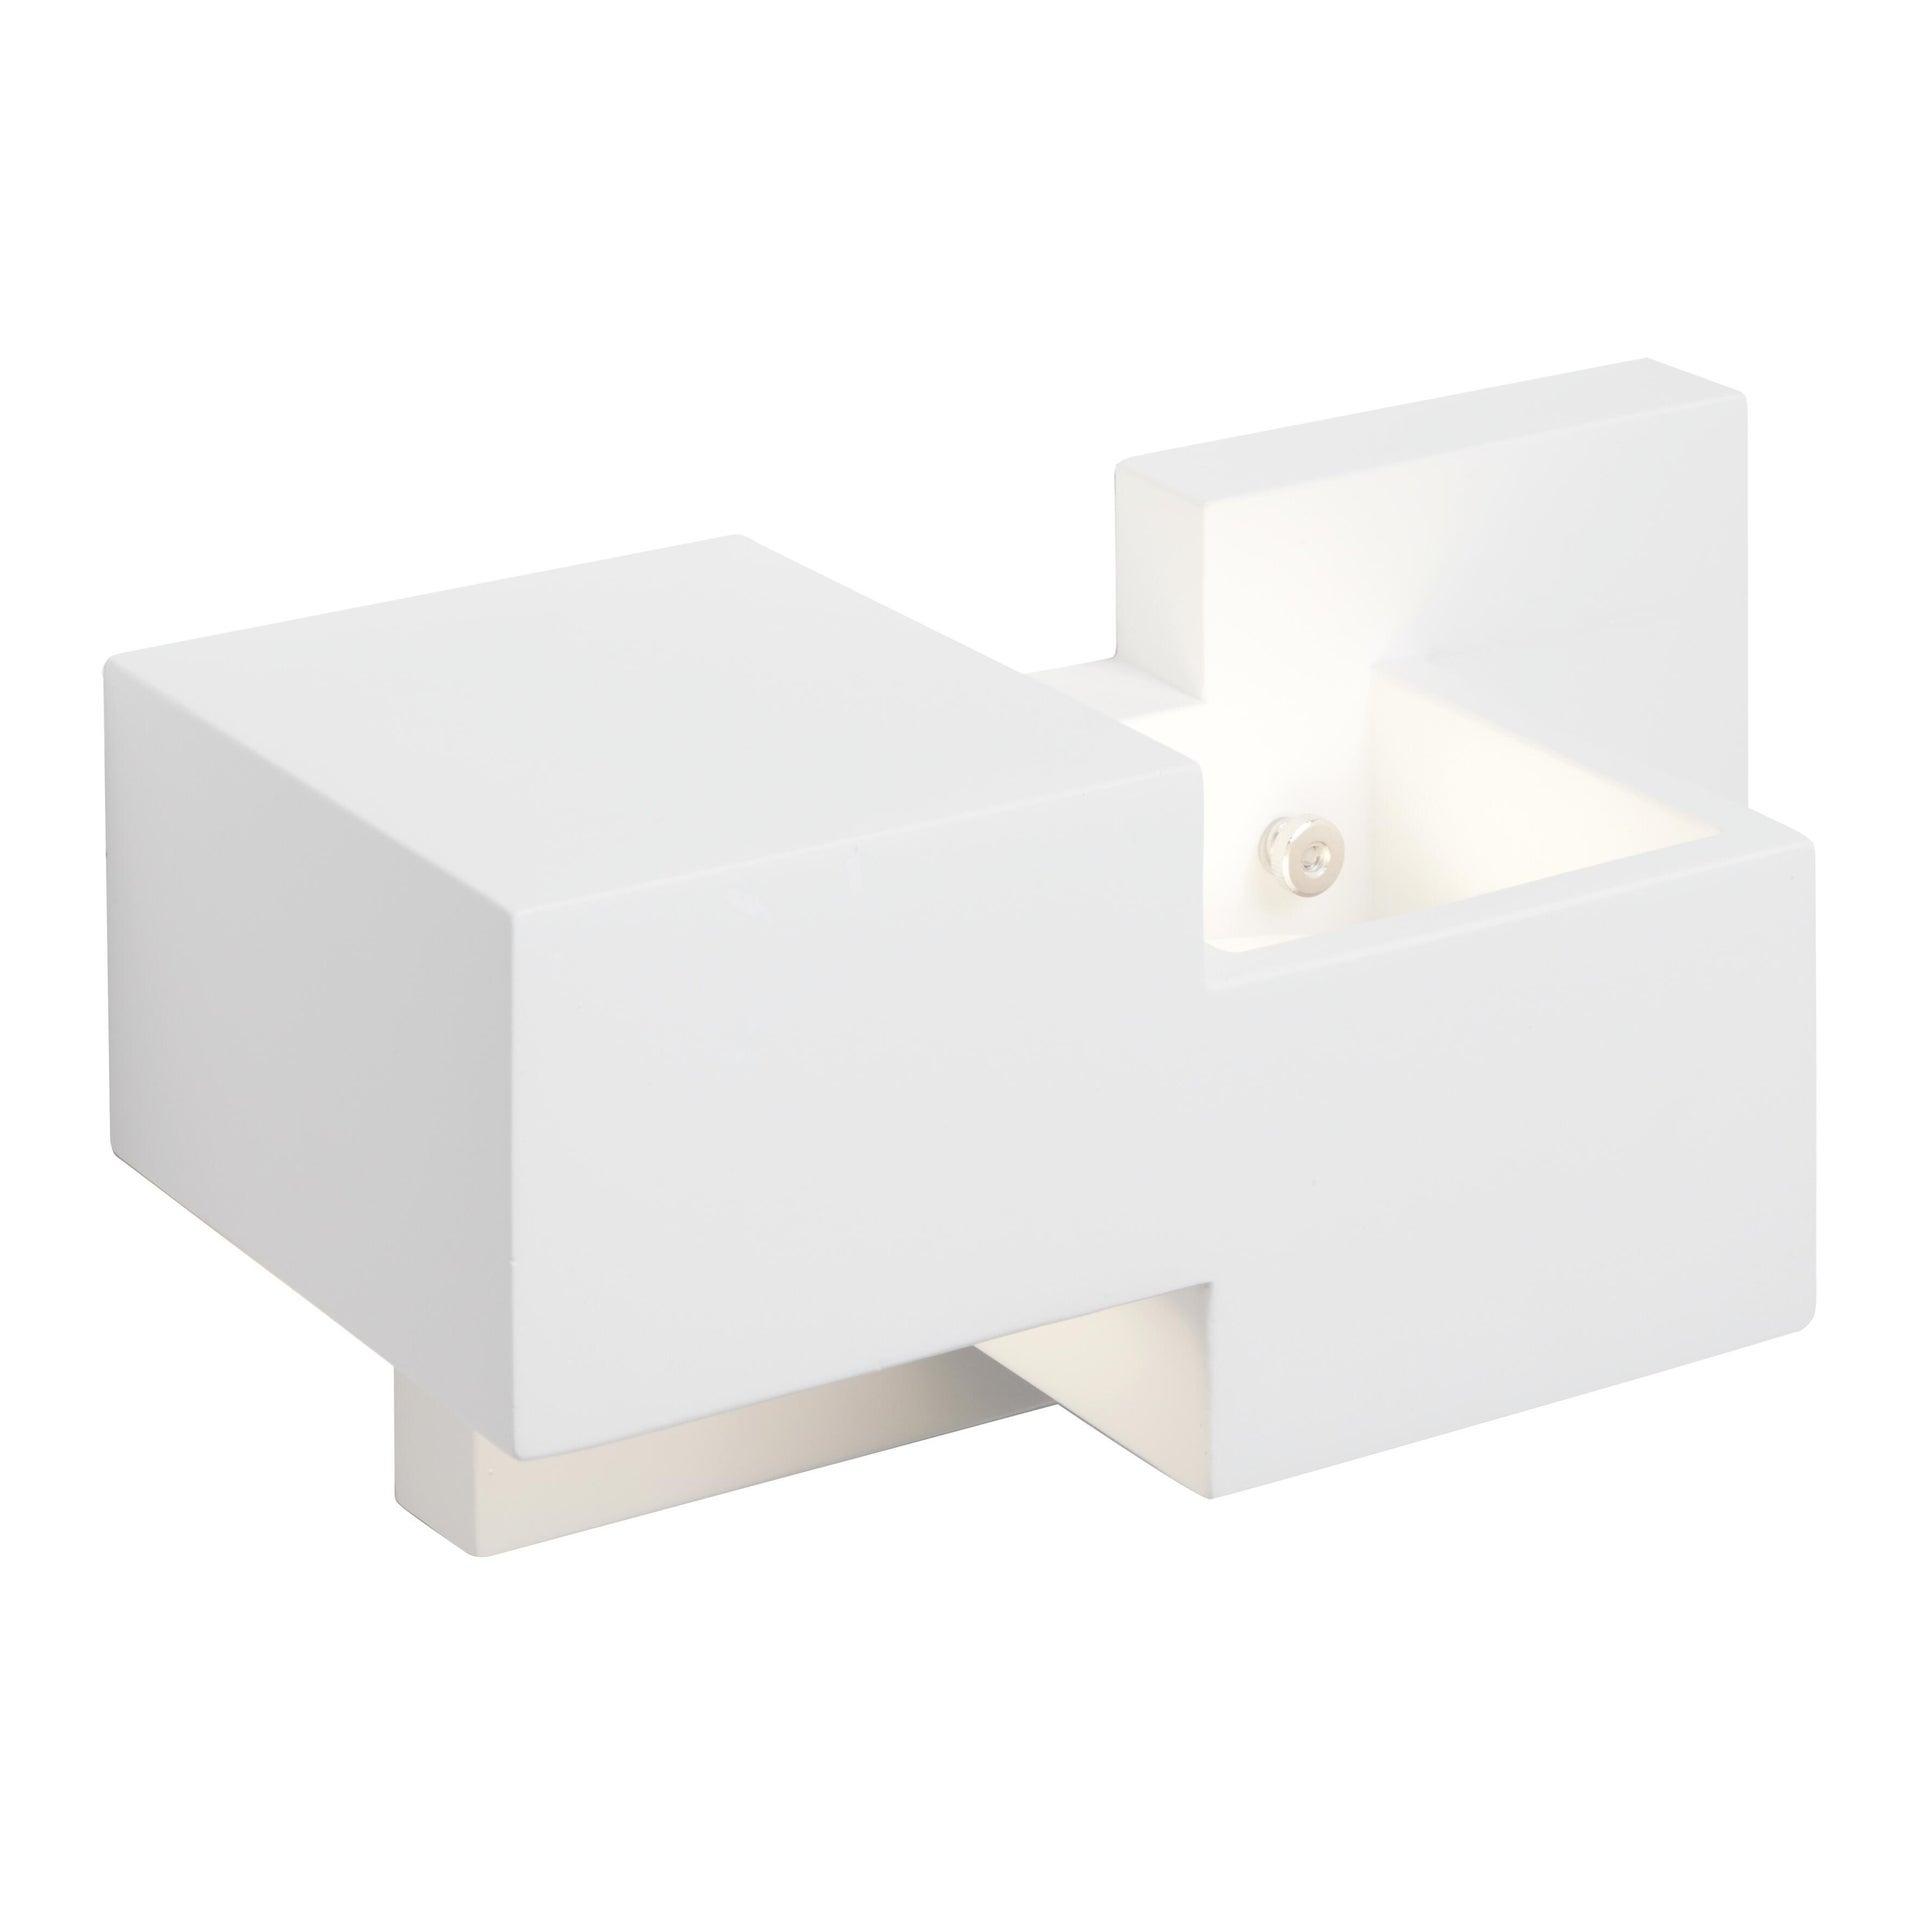 Applique SIDE SMALL bianco, in gesso, 2 luci - 4